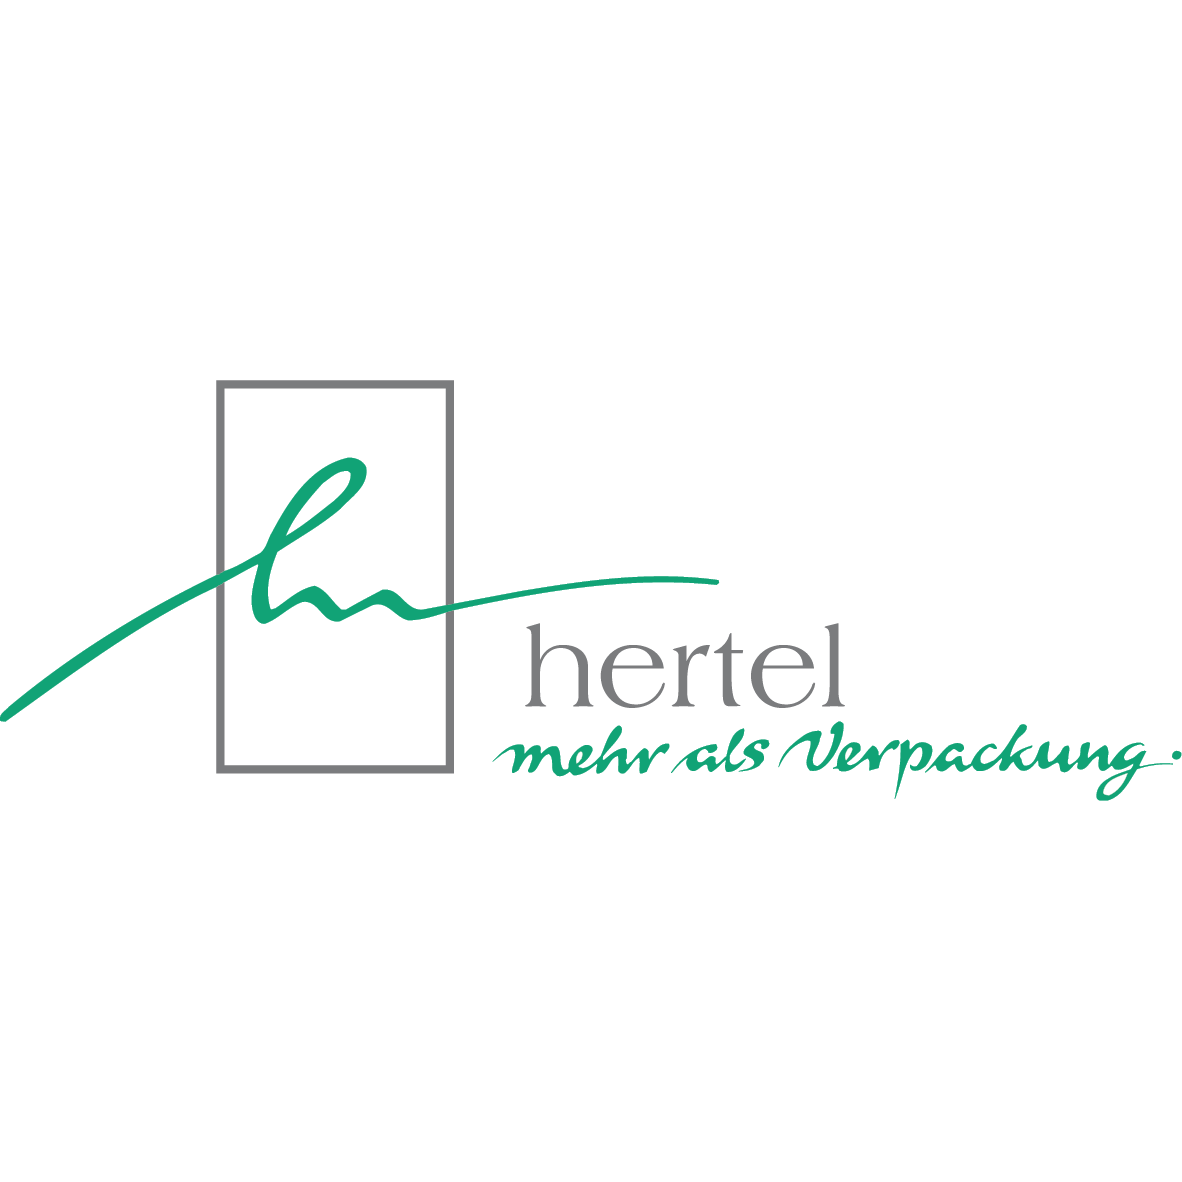 HERTEL & Co Gesellschaft mit beschränkter Haftung